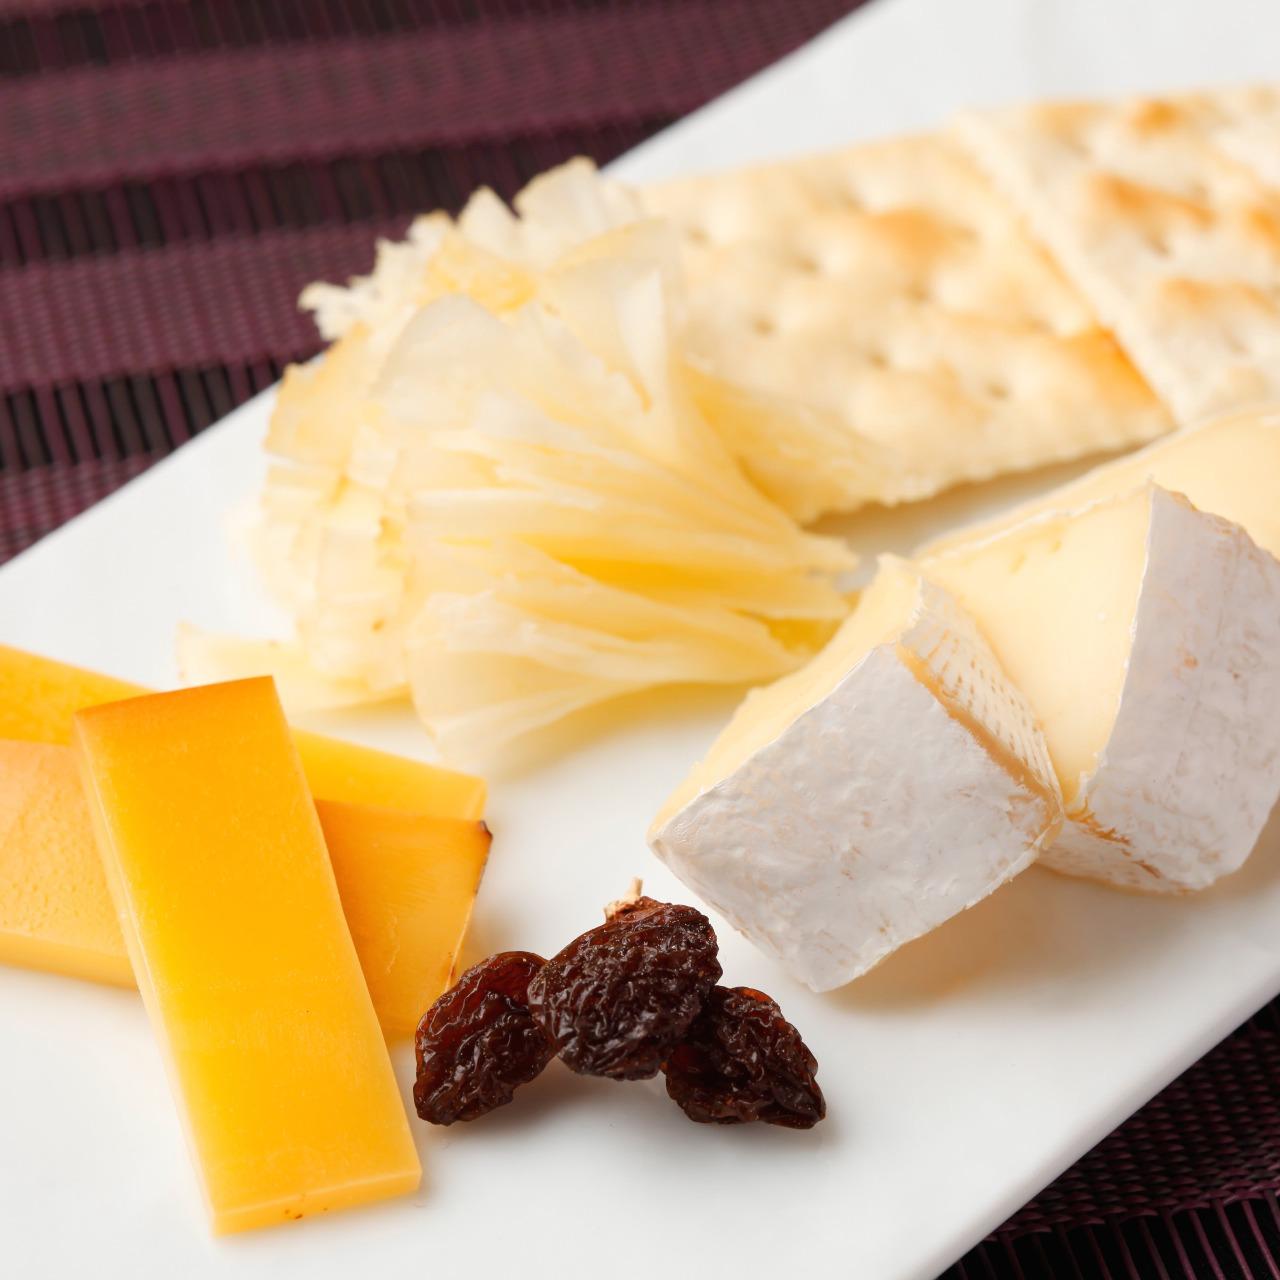 092619d0de3c2bc438935d283ed43248 - チーズ盛り合わせ